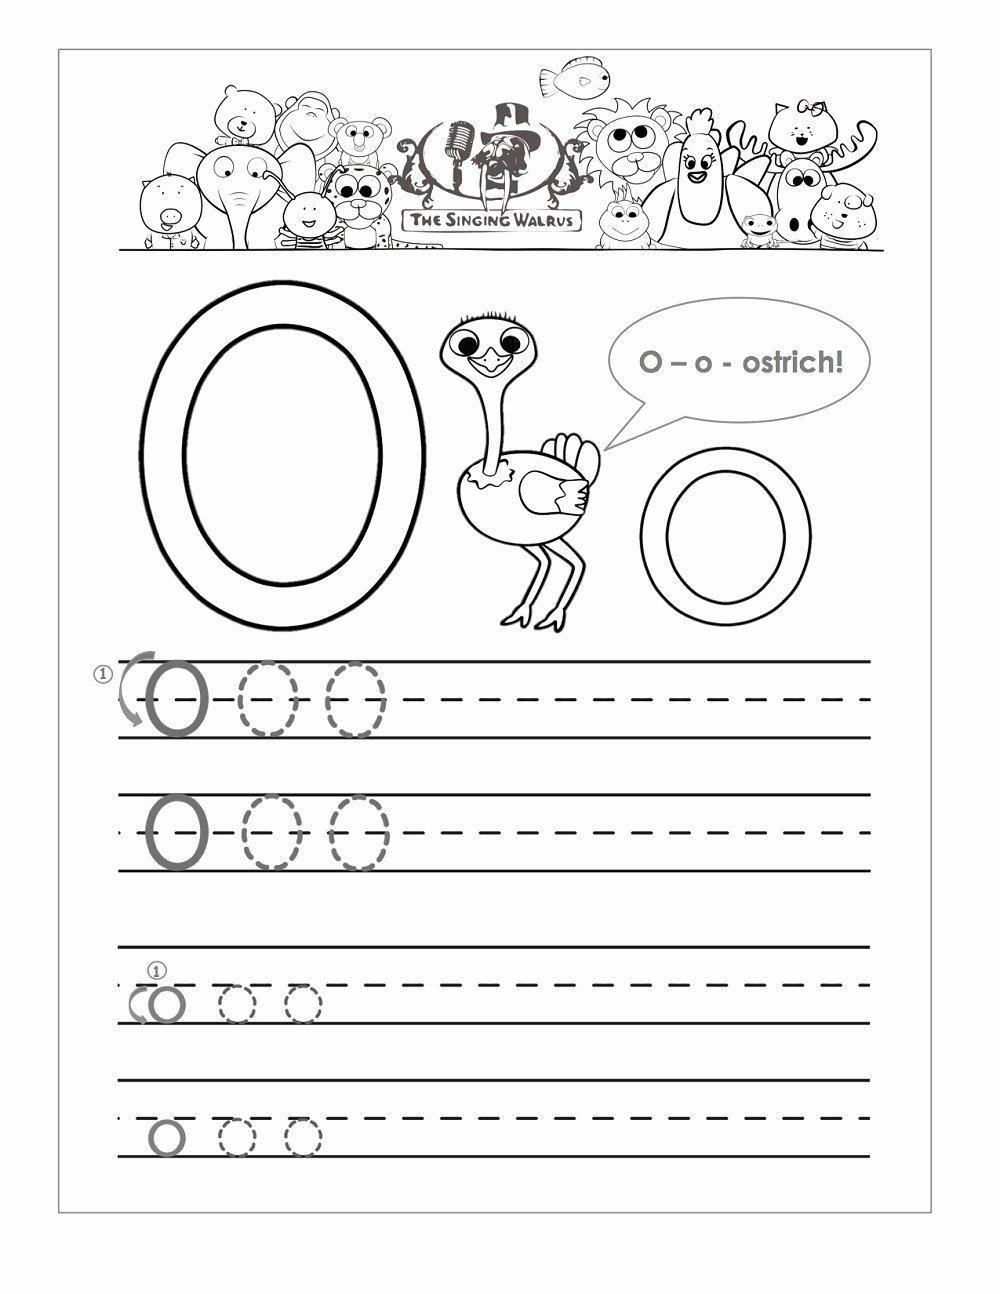 Letter O Worksheets for Preschool Best Of Worksheet the Letter Oorksheets for Kindergarten Object